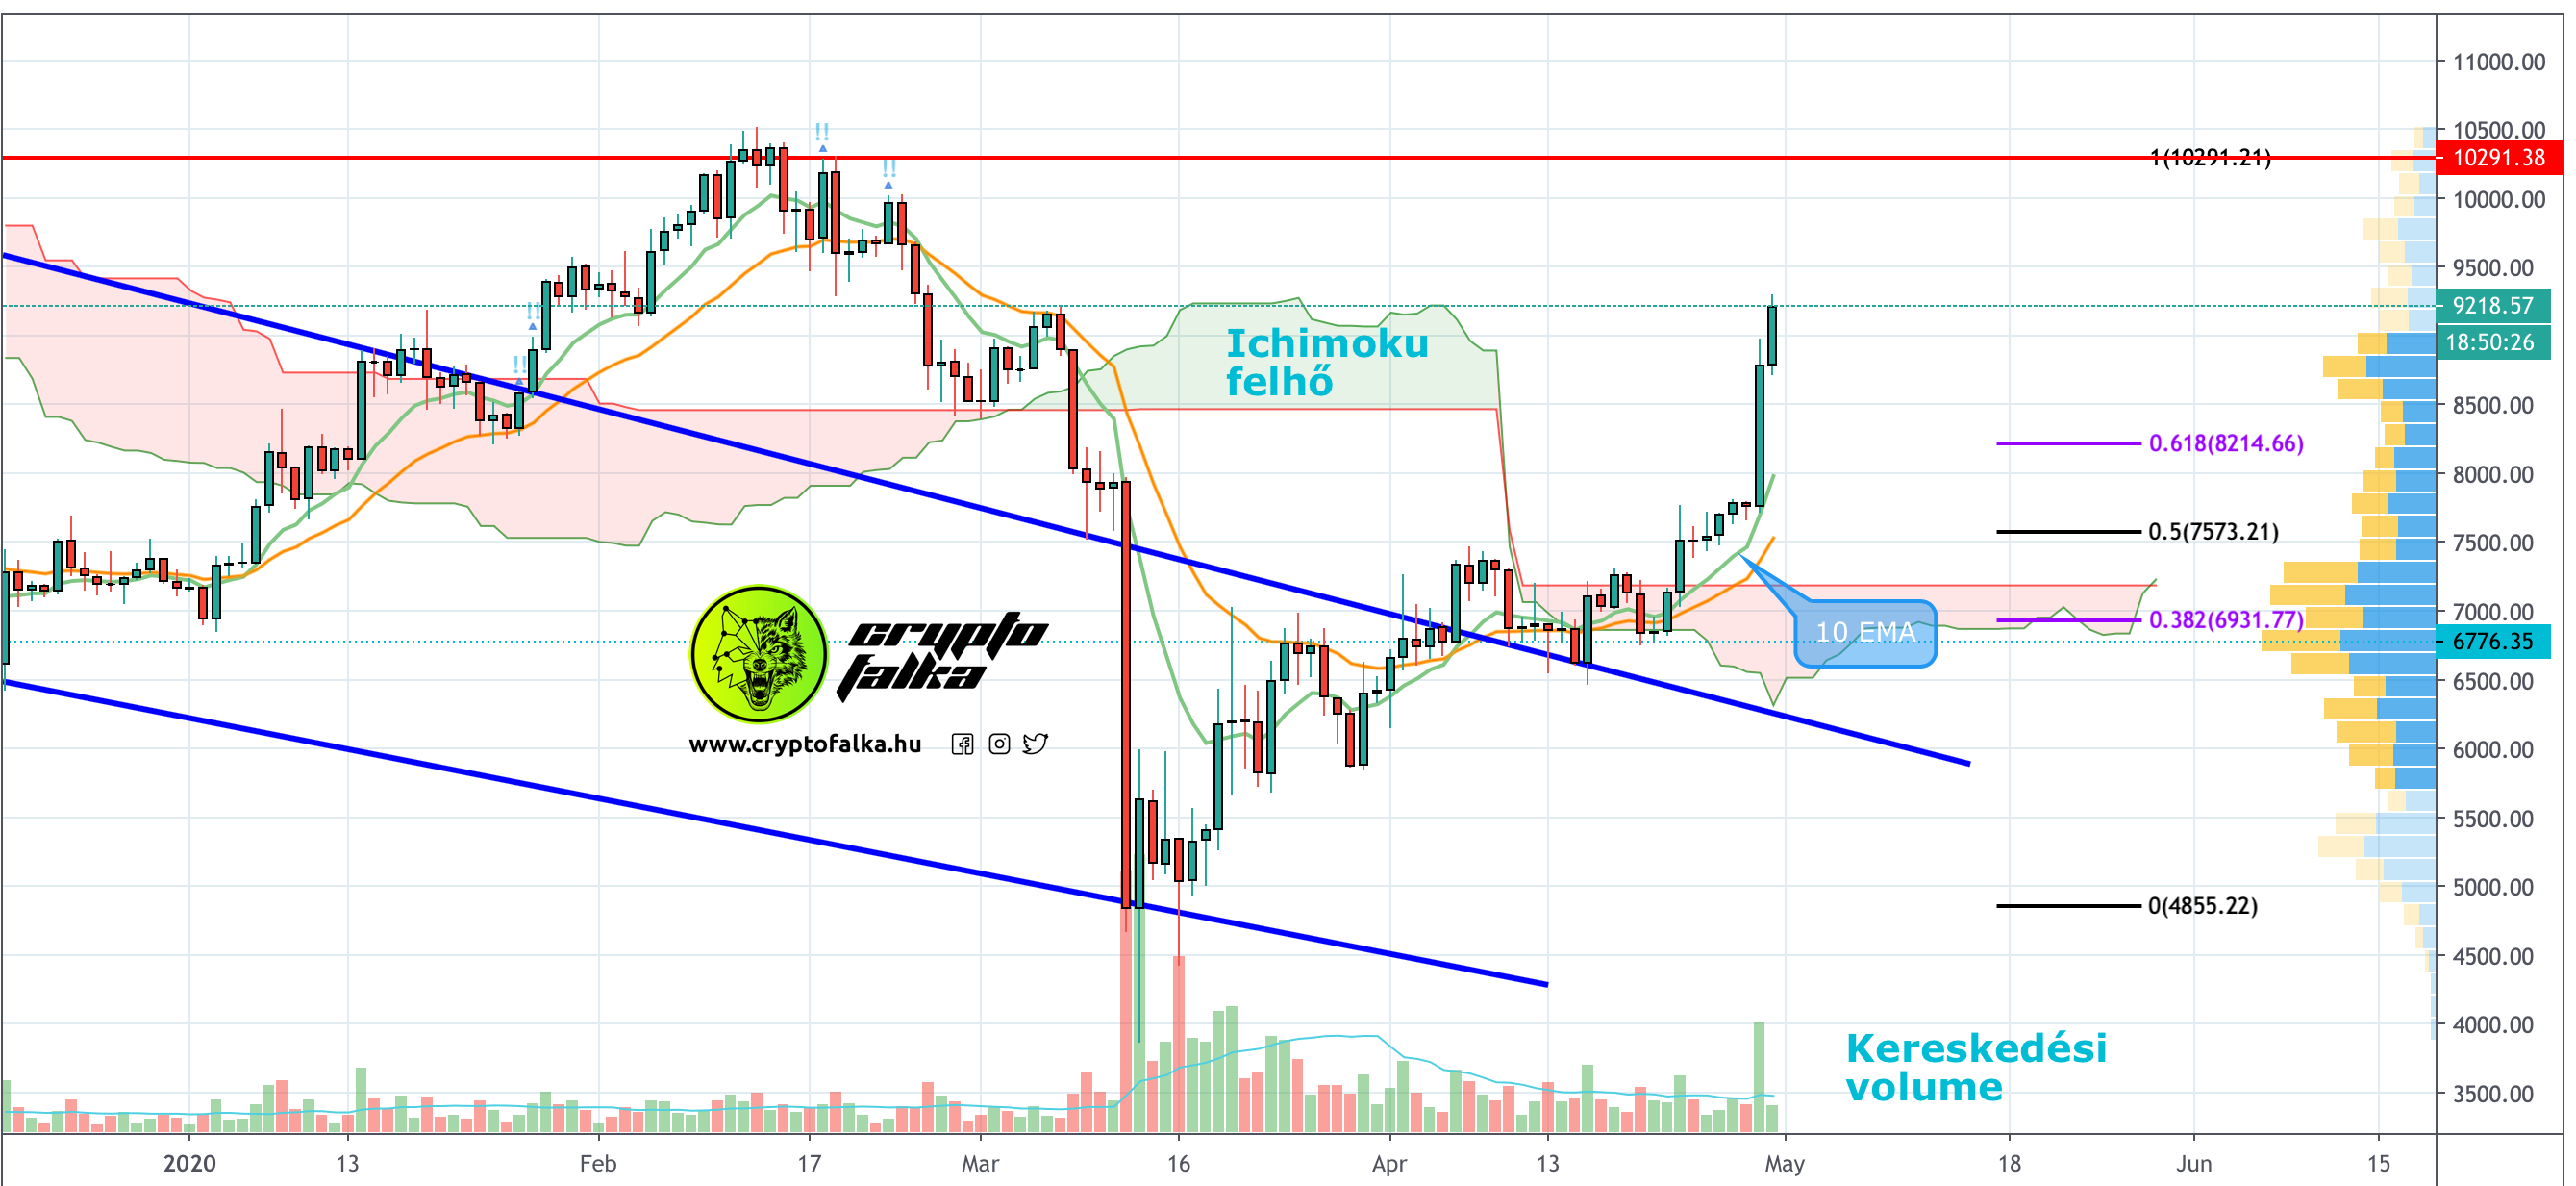 Bitcoin ára emelkedik Cryptofalka